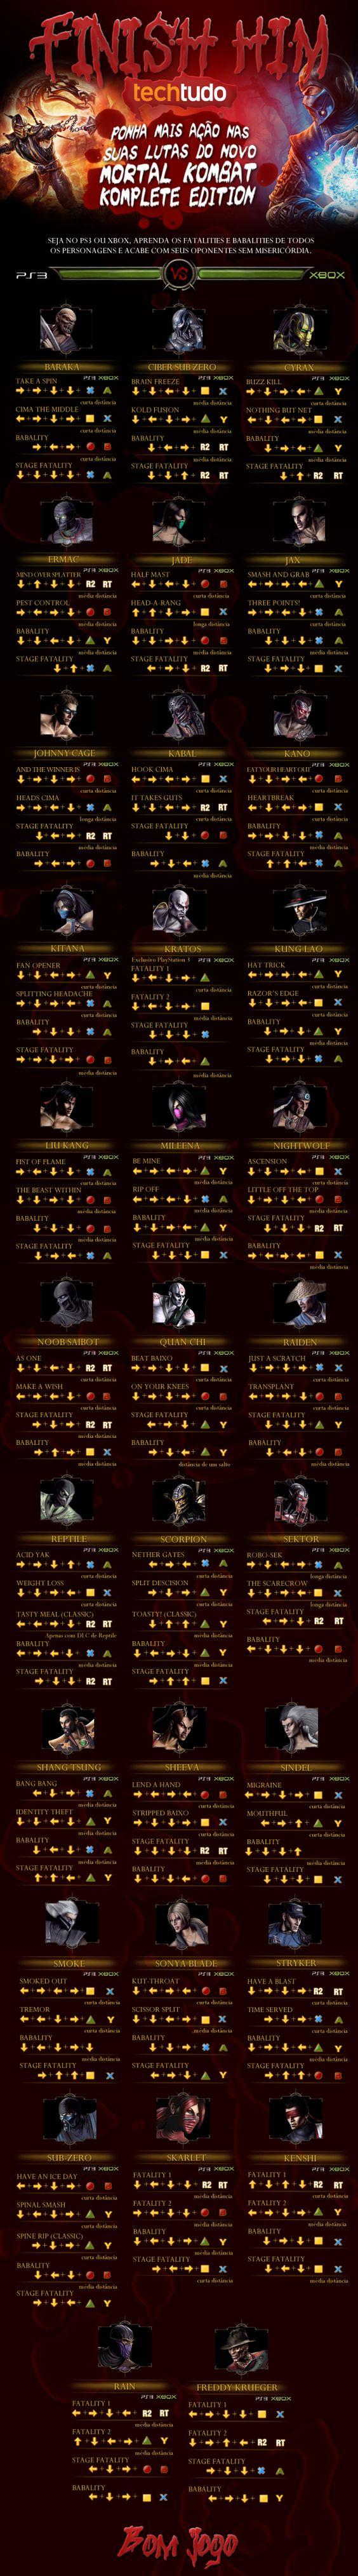 Lista de fatalities de Mortal Kombat | Visit our new infographic gallery at visualoop.com/